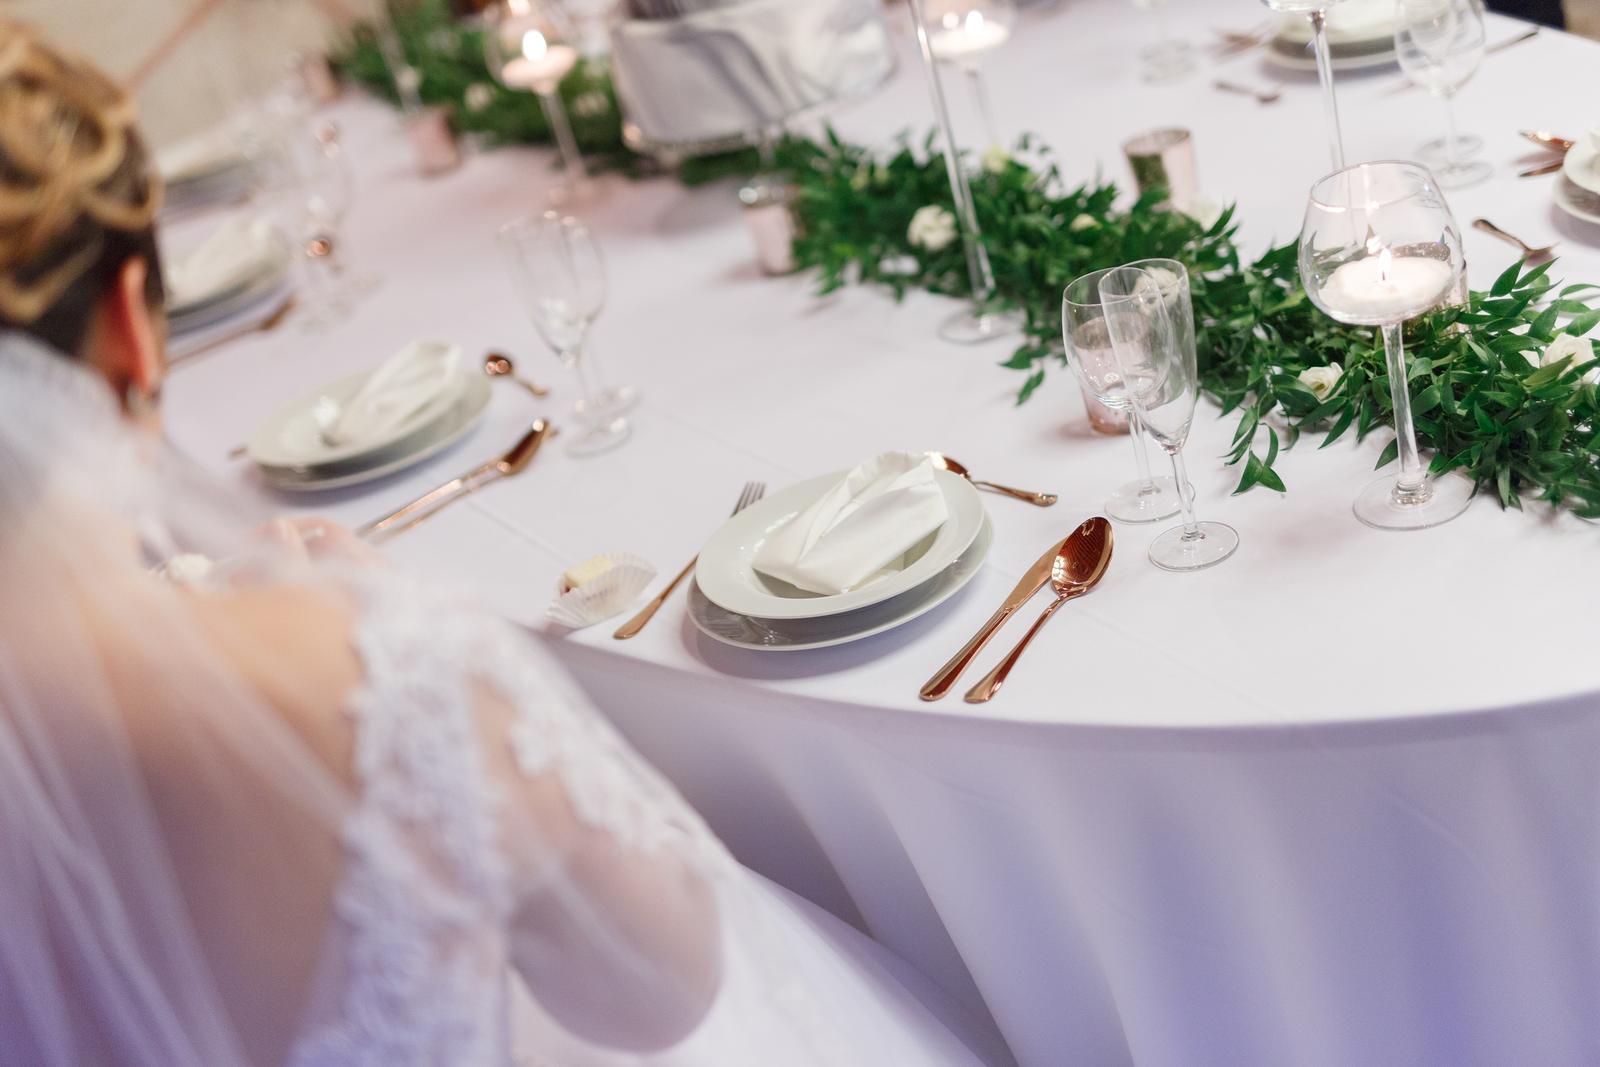 Elipsový stôl s obrusom - Obrázok č. 1